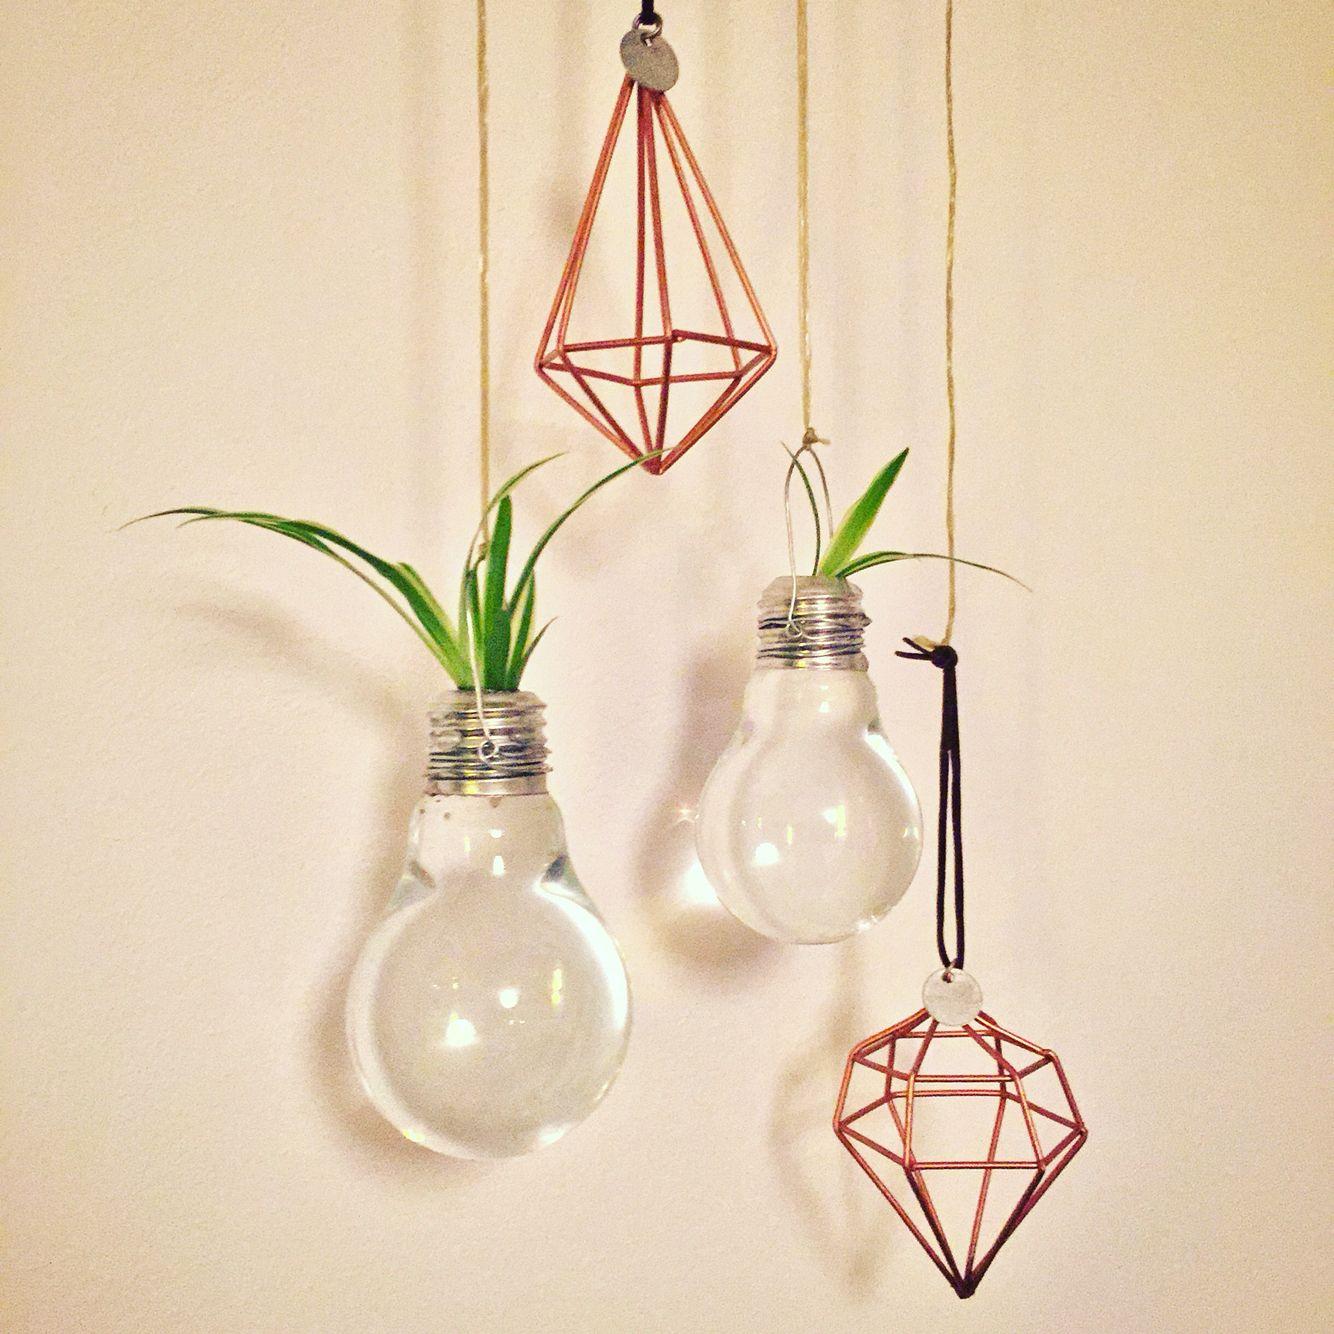 Edison Lamp Xenos Interesting Instagram With Edison Lamp Xenos